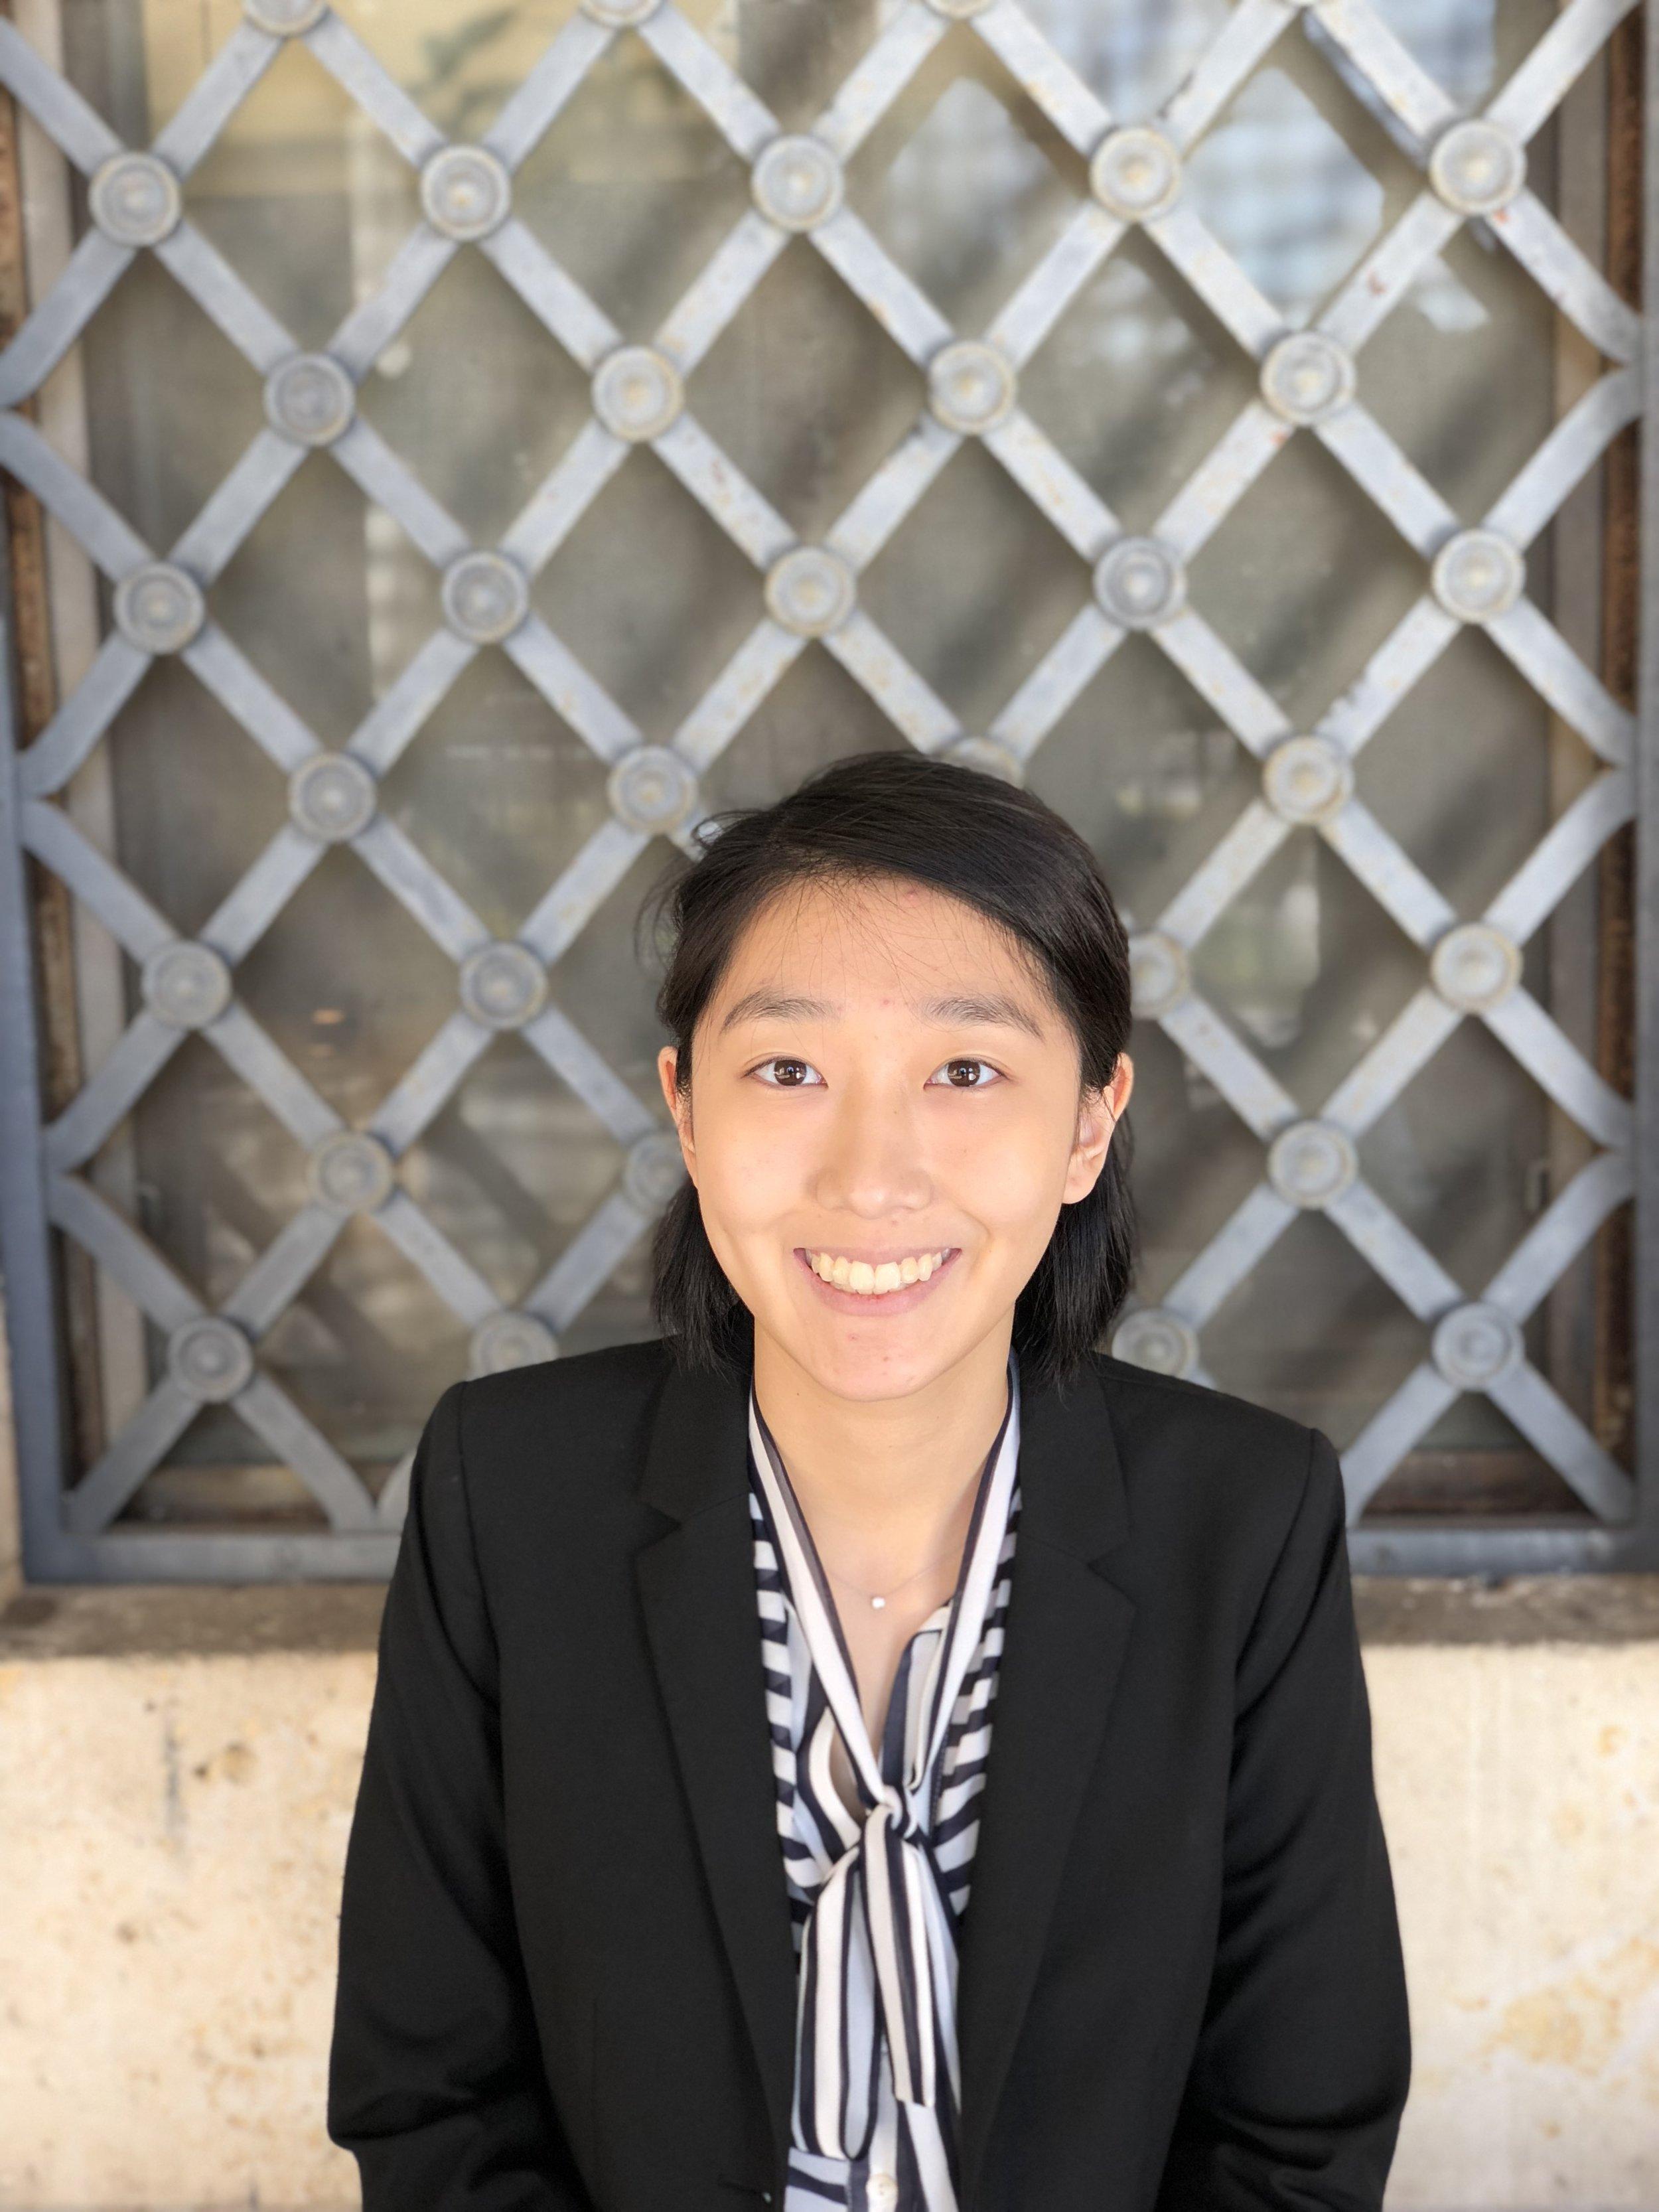 Linda Yoo, Vice President of External Affairs